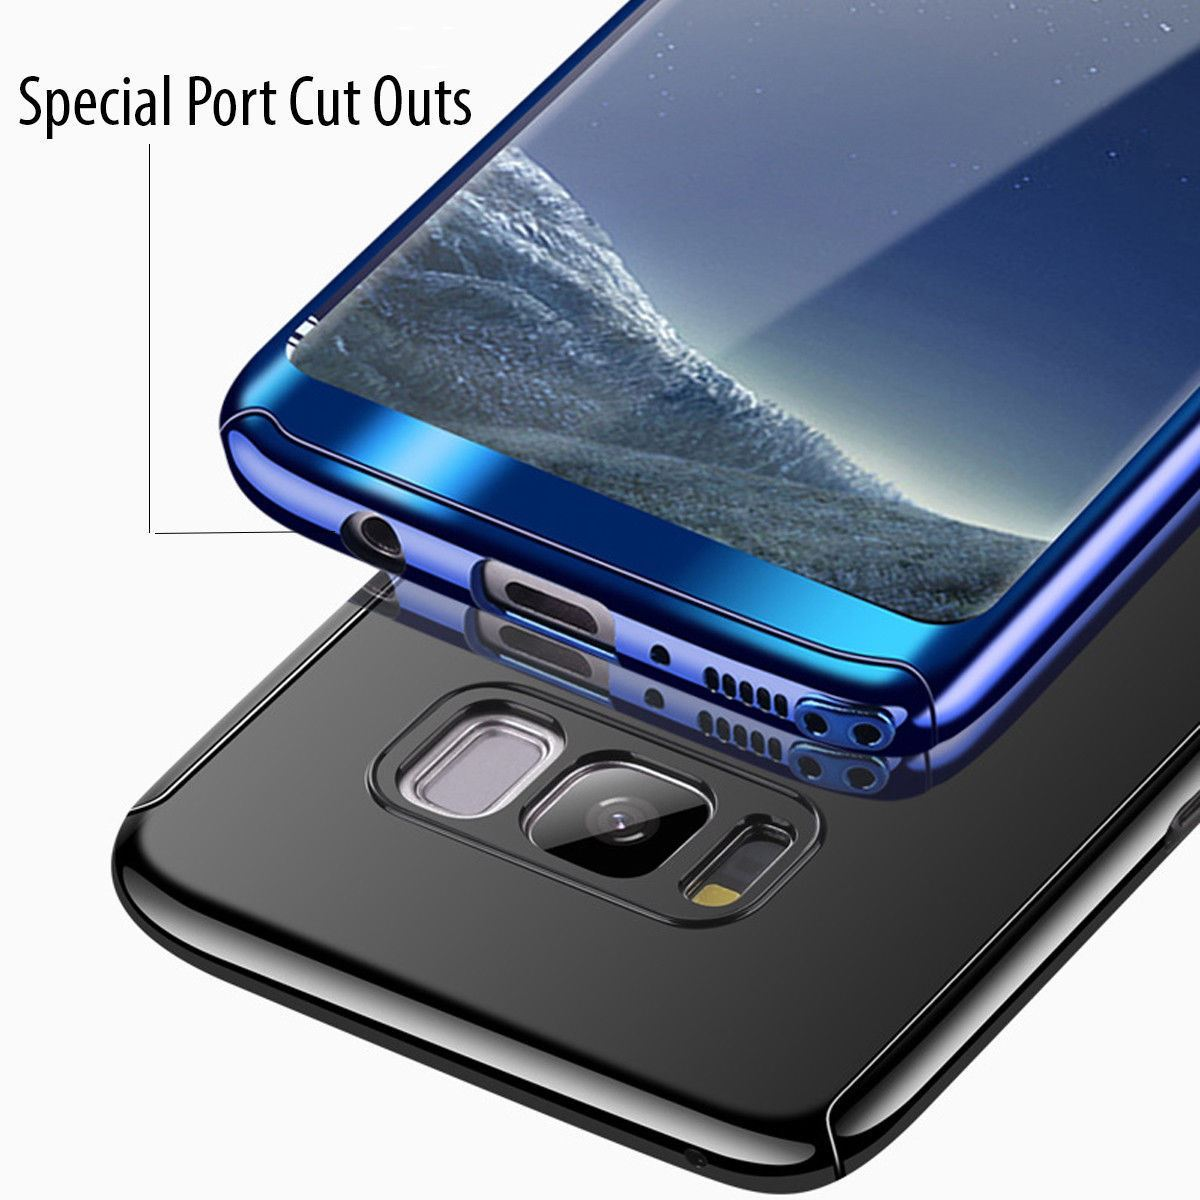 Shockproof-Hybrid-360-Ultra-Thin-Mirror-Hard-Case-Samsung-Galaxy-S7-edge-S8-S9 thumbnail 57